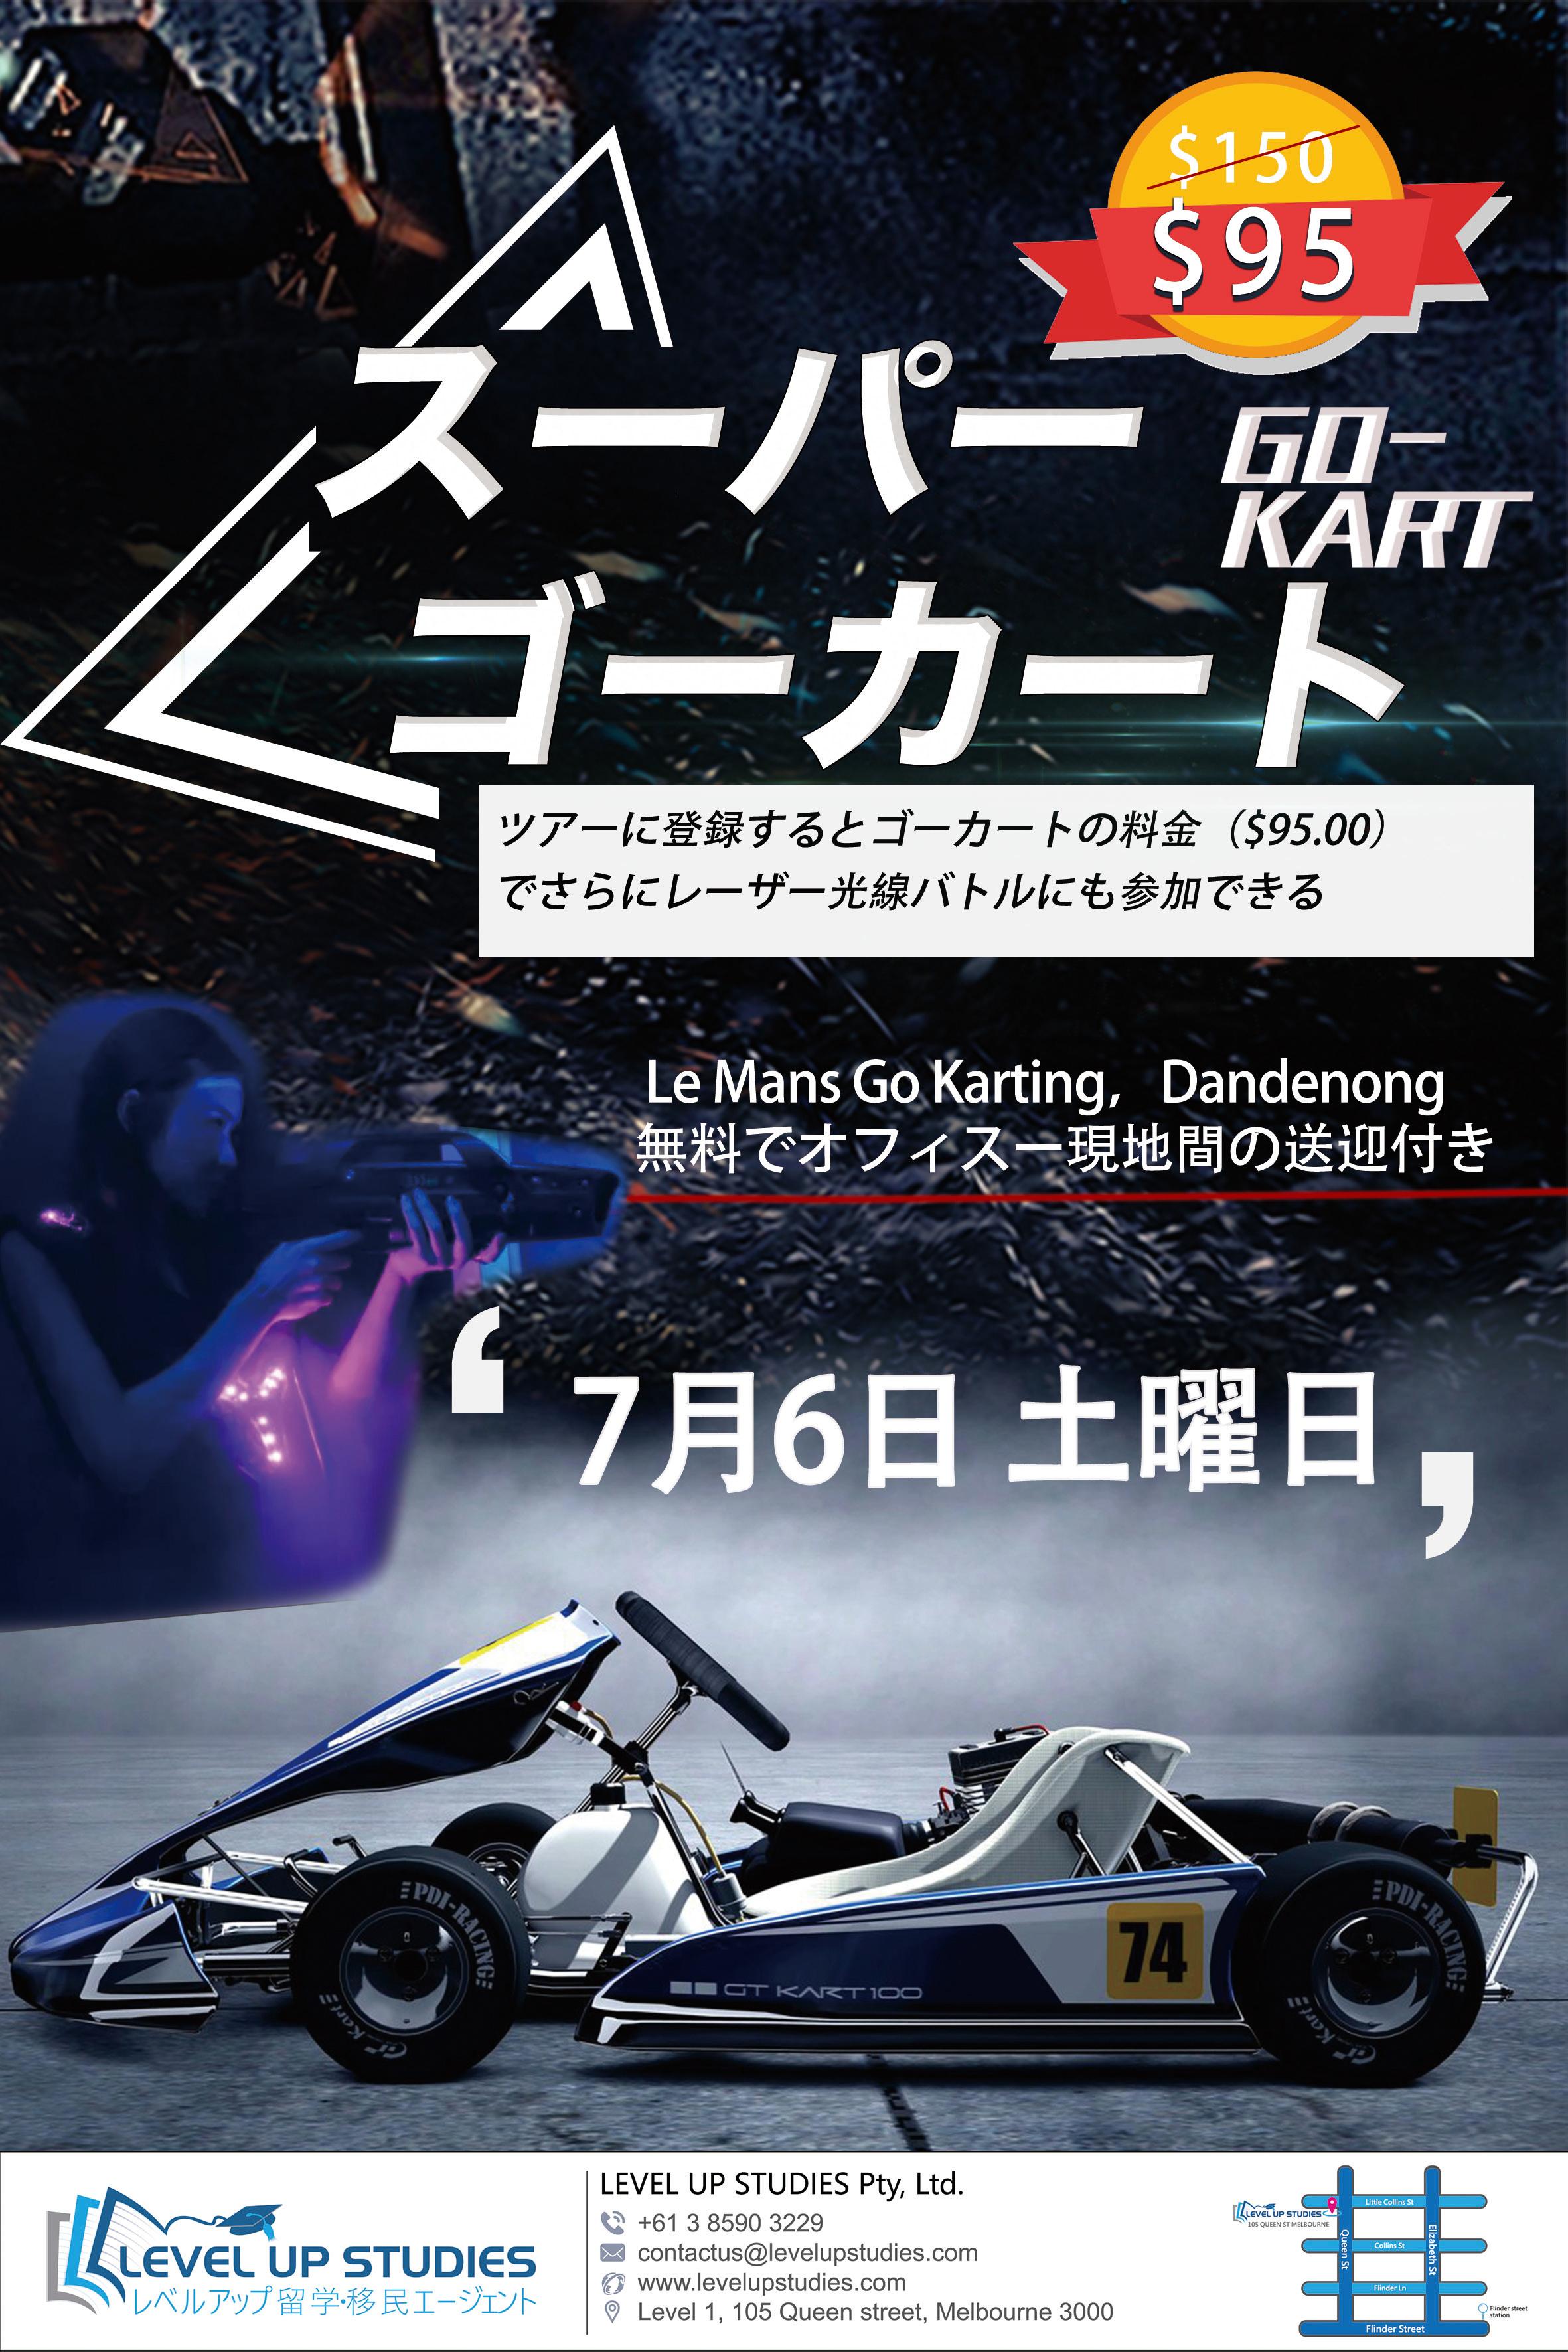 卡丁车japanese 6.7.2019